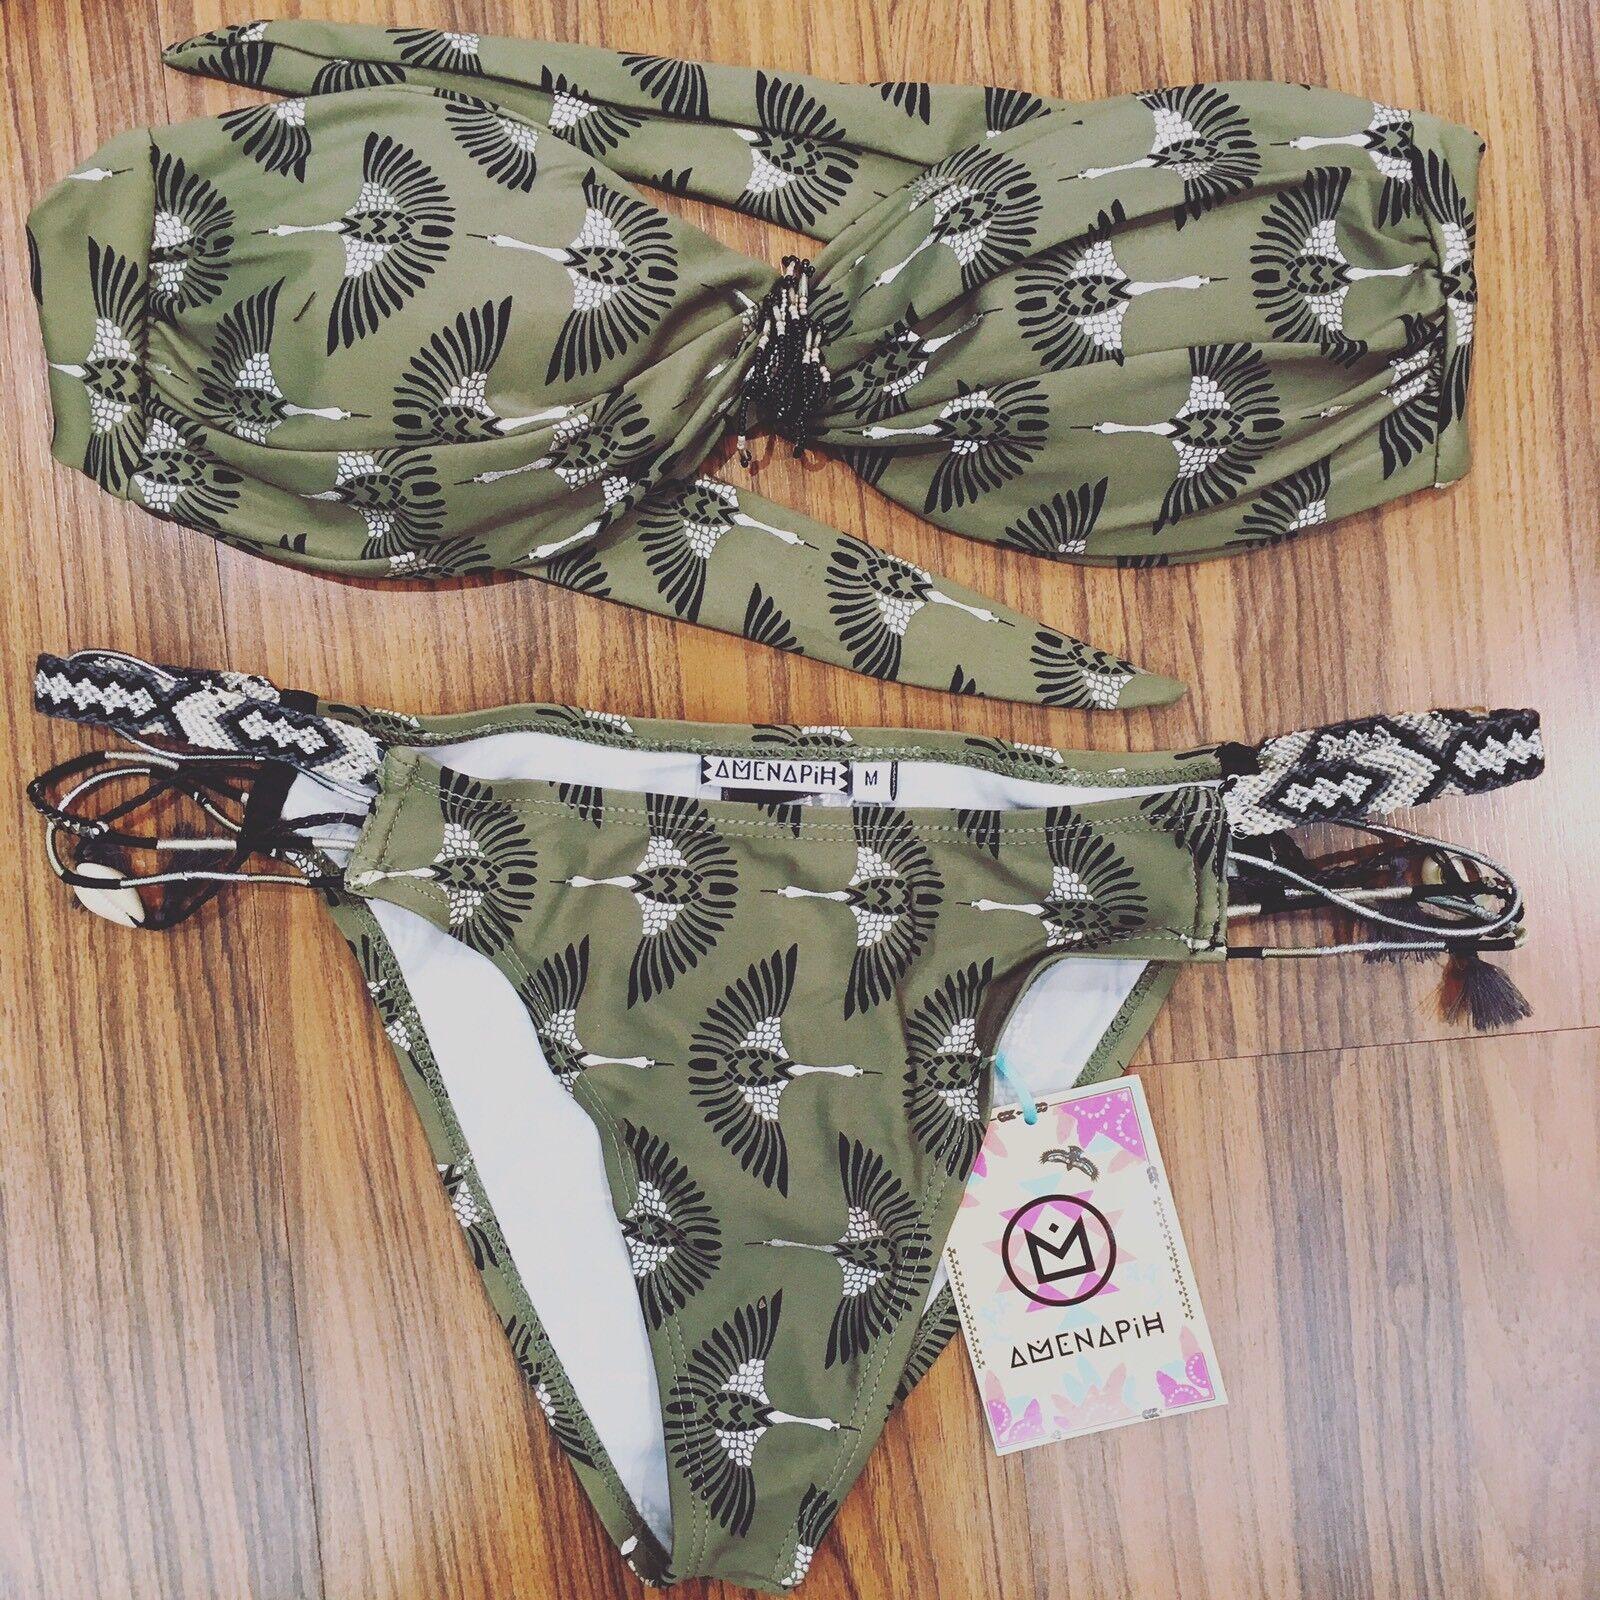 Bikini Pavoni Verdone Costume Fascia Mare Beachwear Amenapih By Hipanema Tg.Smal